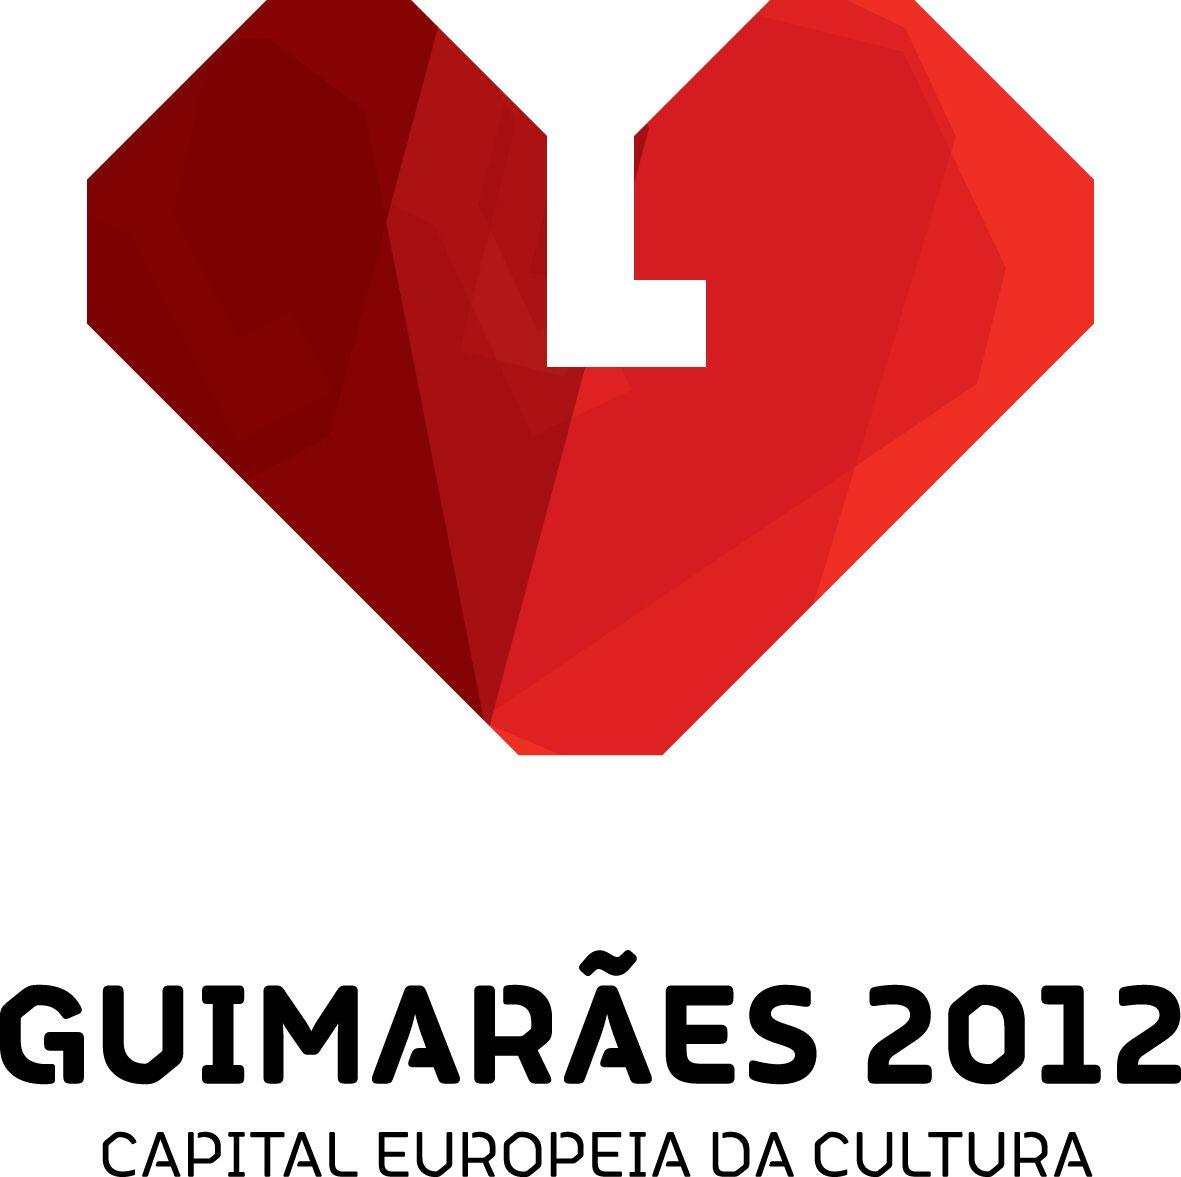 Guimarães 2012, Capital Europeia da Cultura